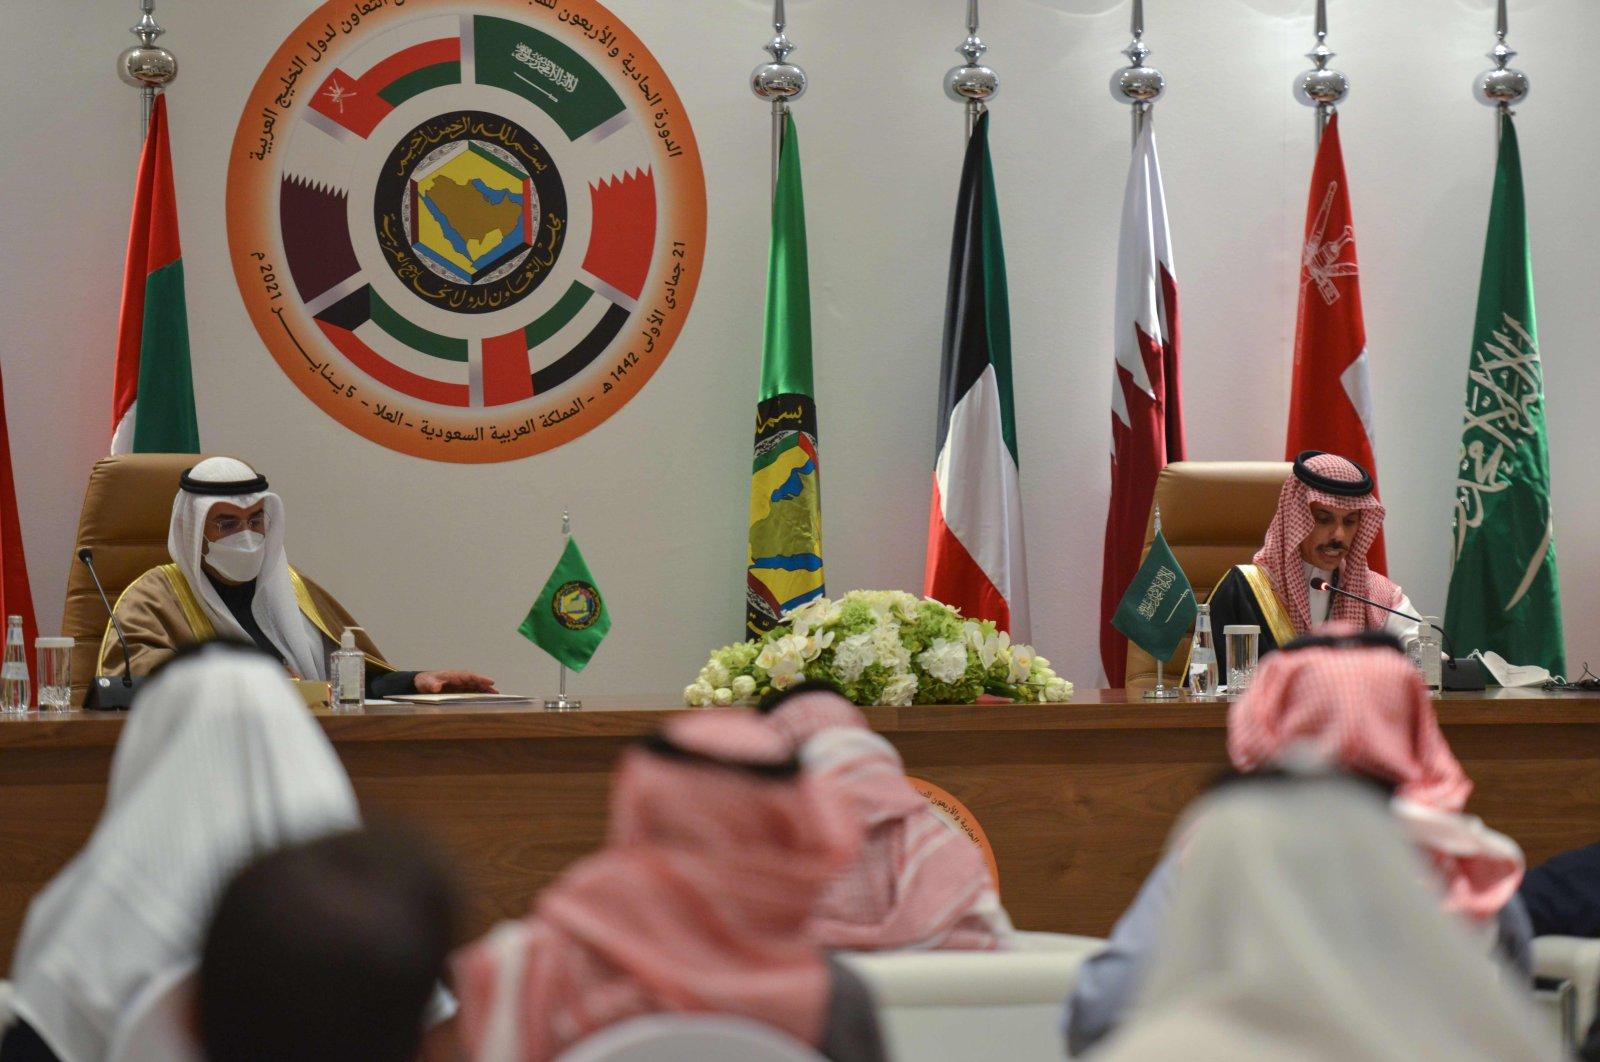 Gulf Cooperation Council (GCC) Secretary-General Nayef bin Falah Al-Hajraf (L) and Saudi Foreign Minister Prince Faisal bin Farhan al-Saud hold a press conference at the end of the GCC's 41st summit, in the city of Al-Ula, northwestern Saudi Arabia, Jan. 5, 2021. (AFP Photo)